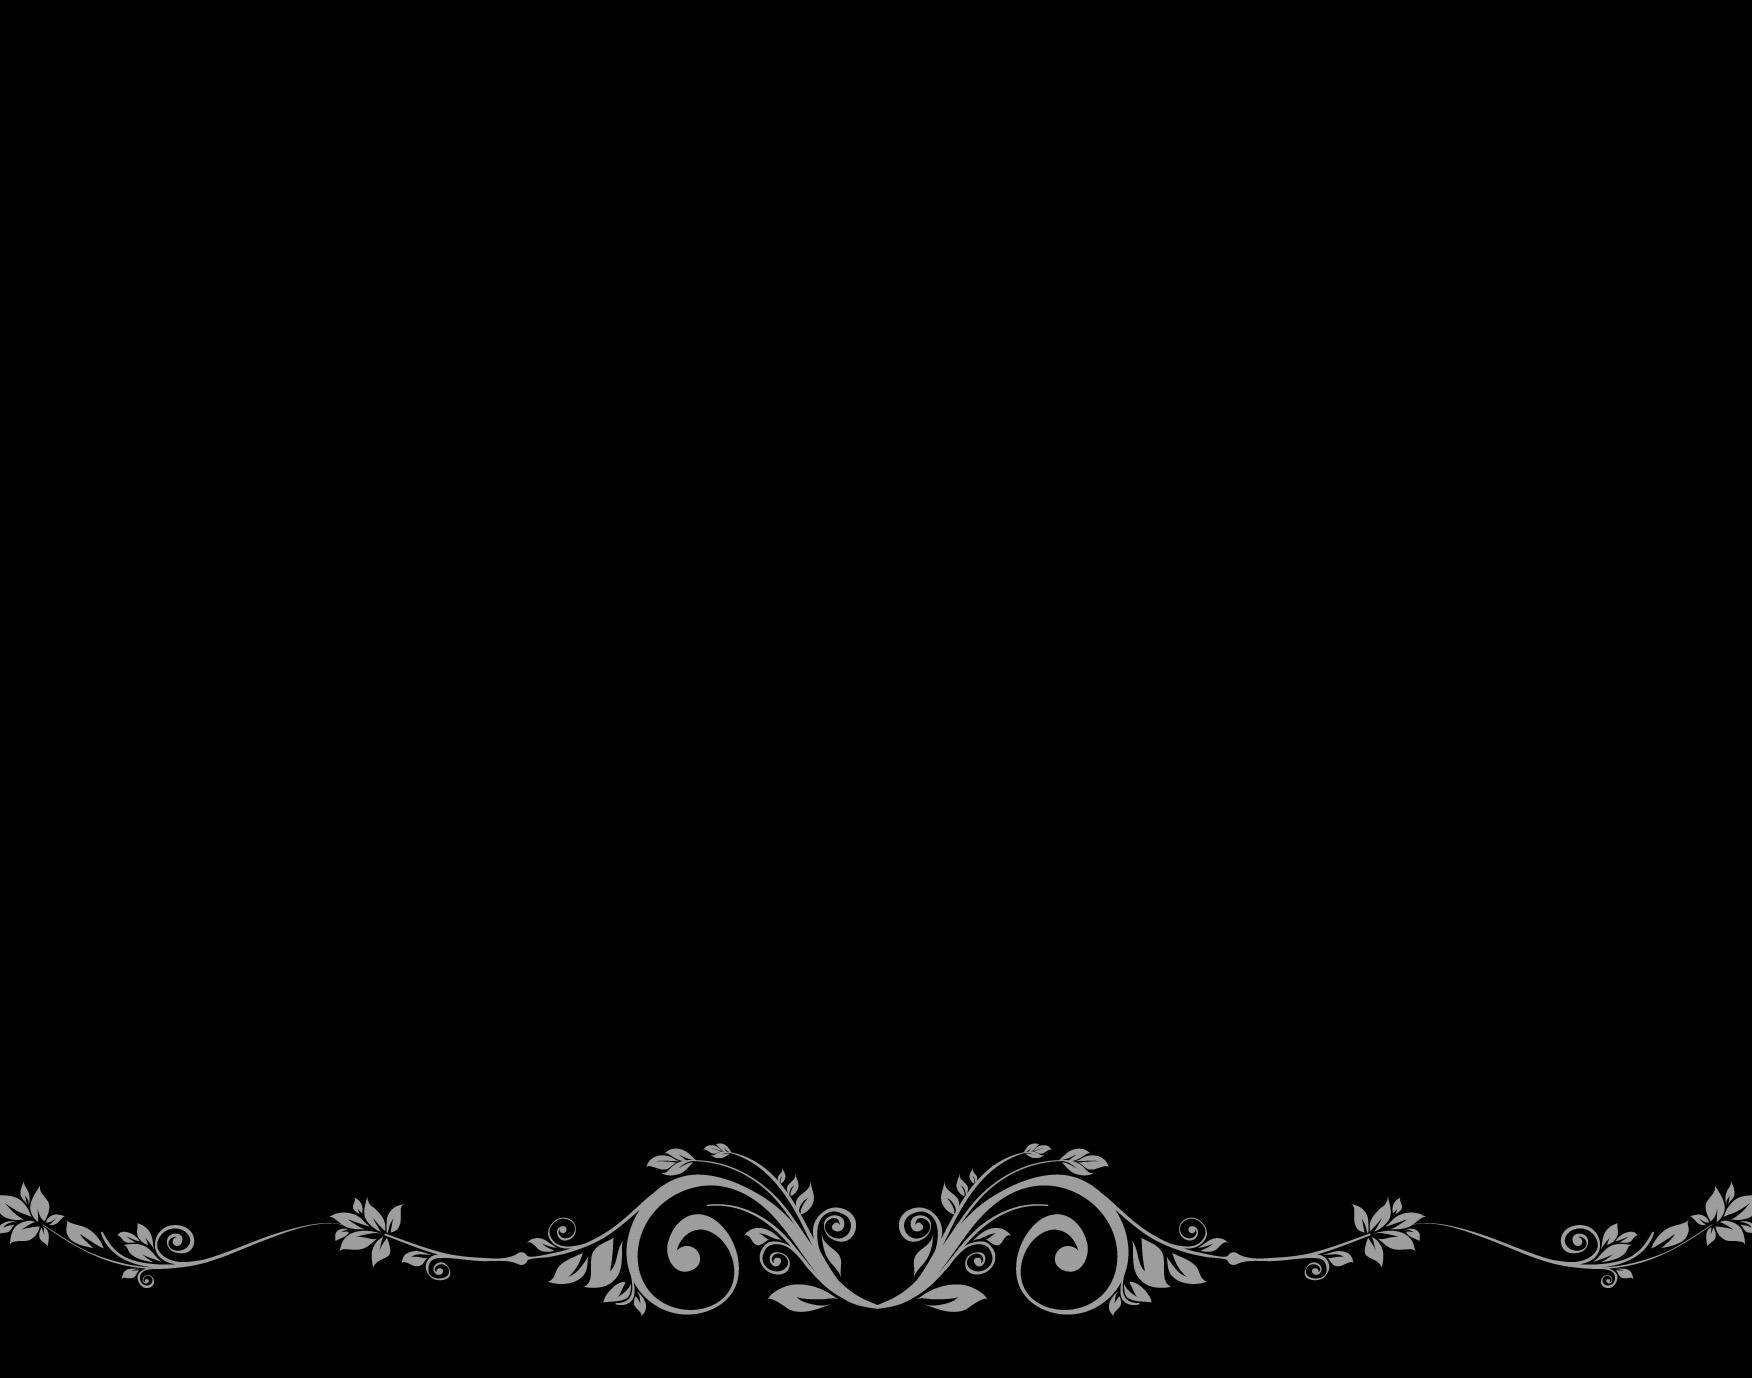 45+] Fancy Black Wallpaper On WallpaperSafari